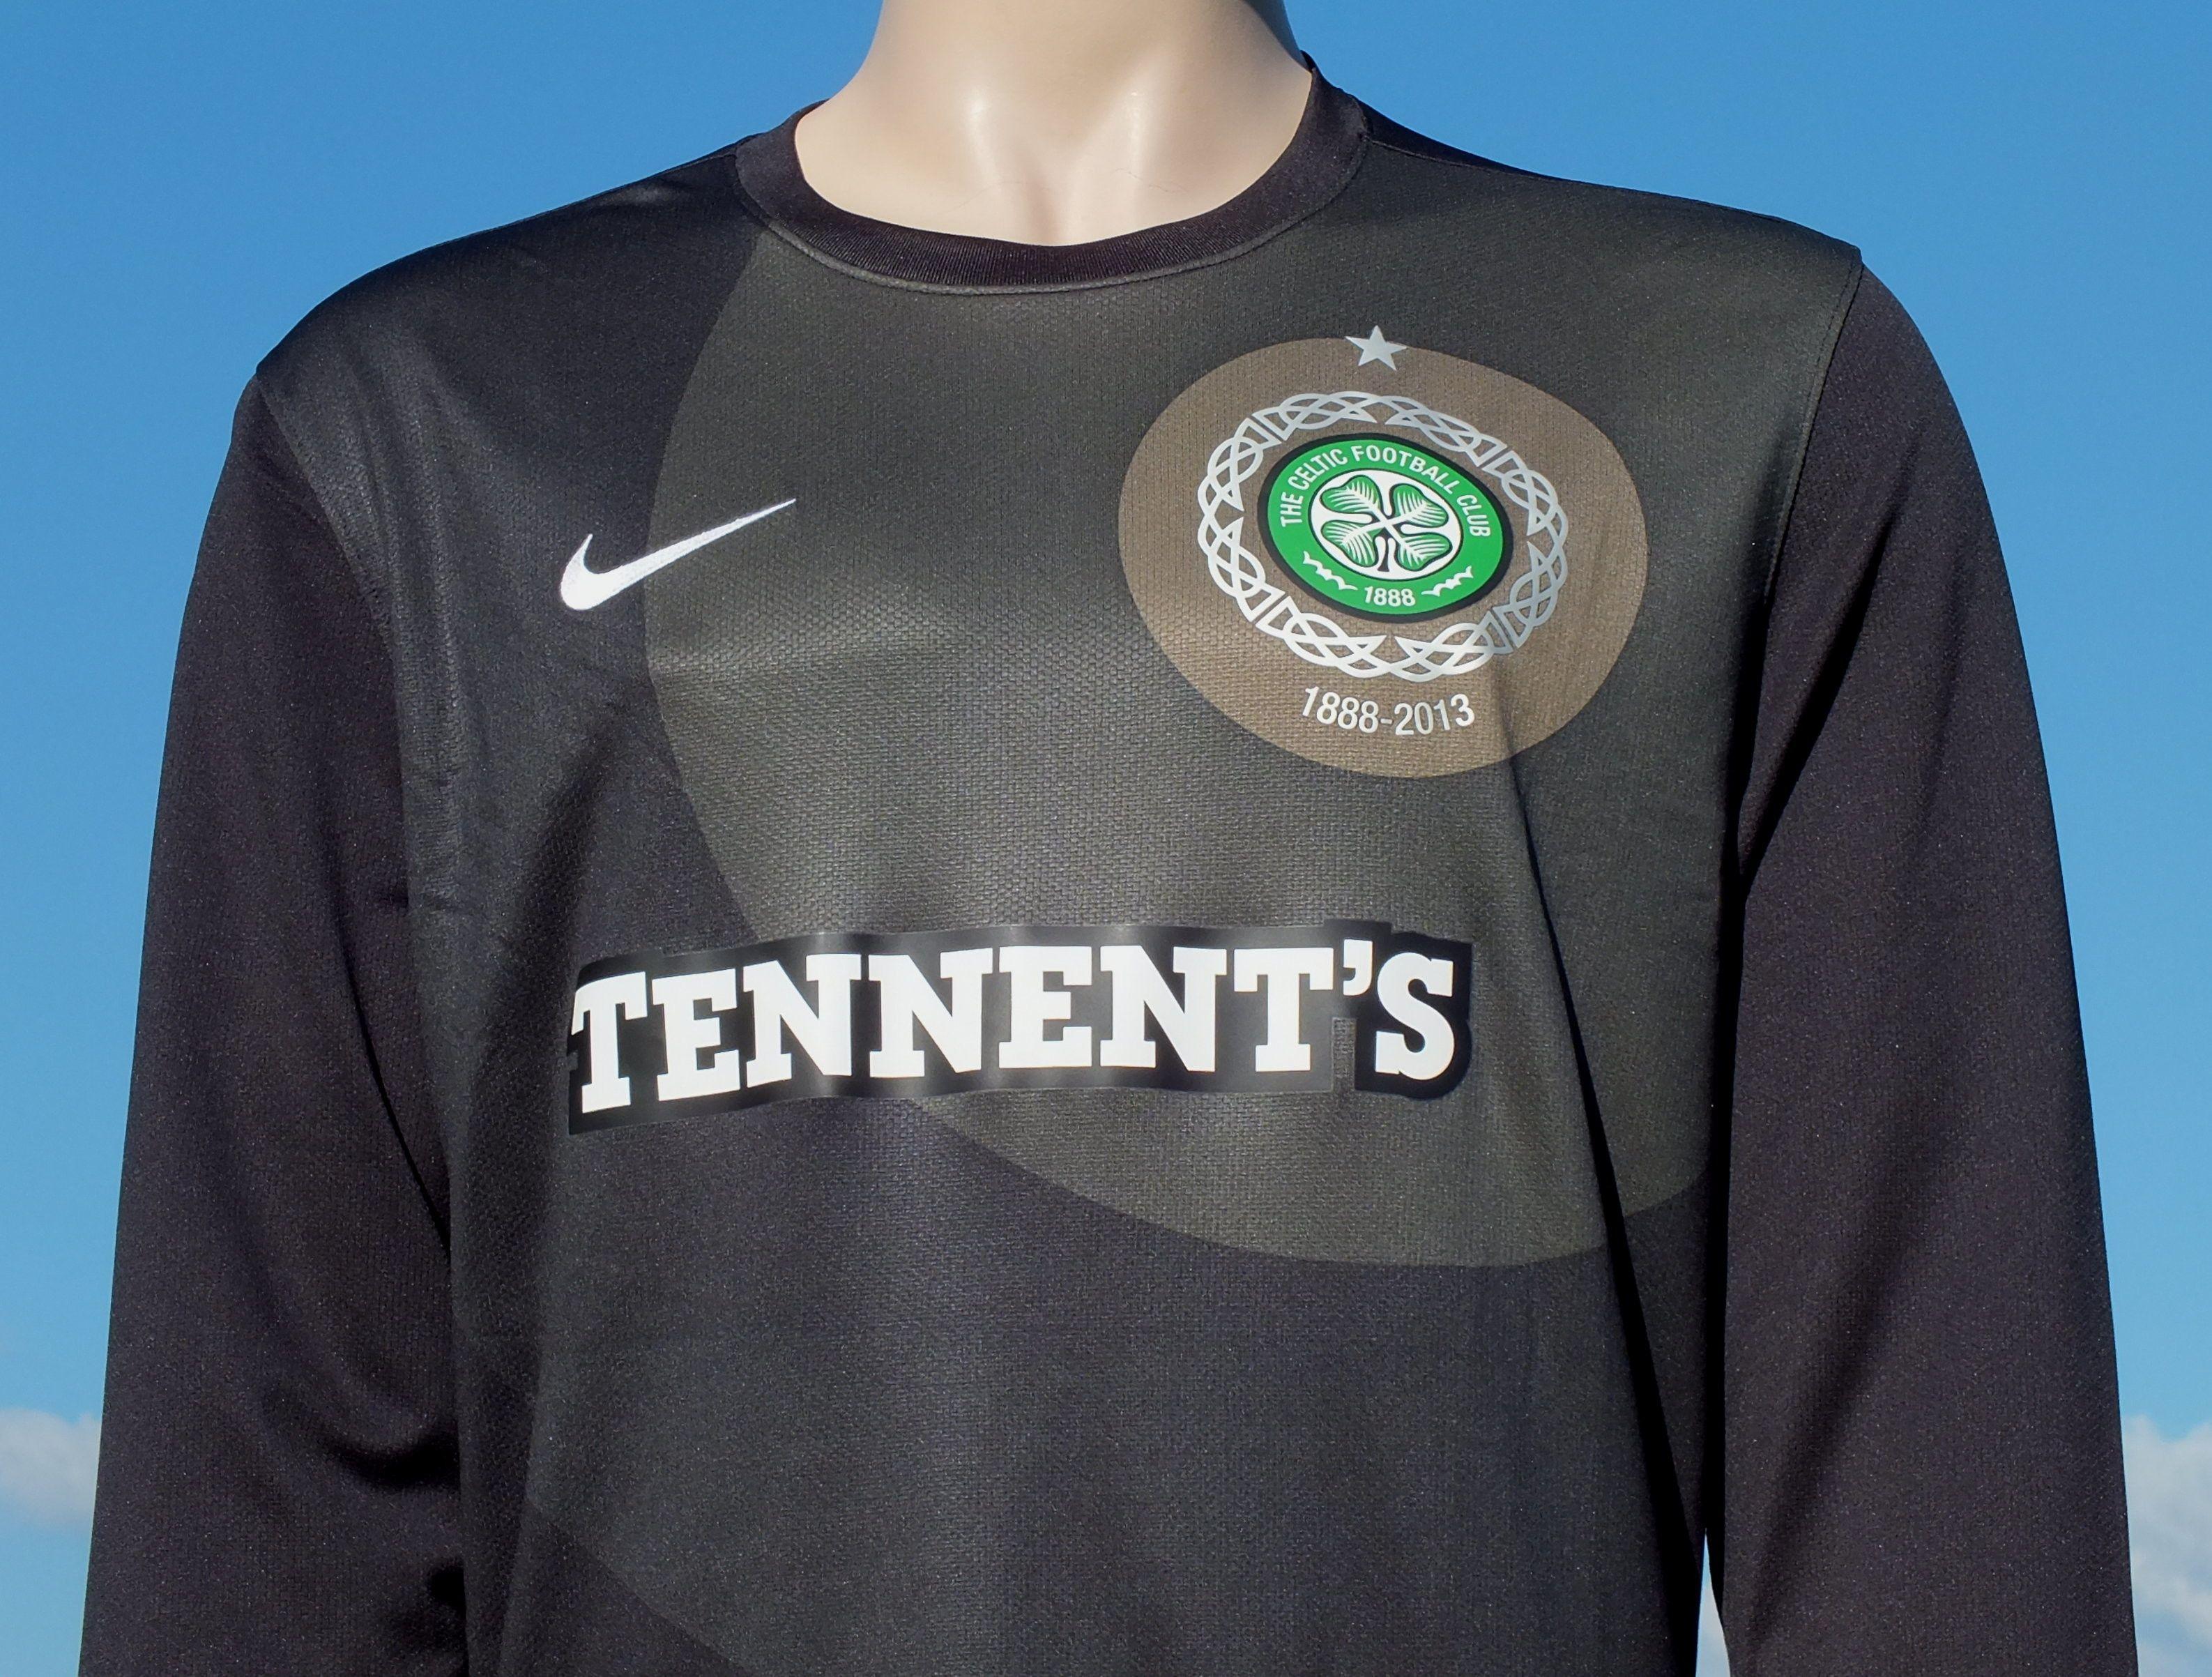 Celtic FC Nike Away Season 2012-2013 Goalkeeper Shirt 125th Anniversary Replica Edition